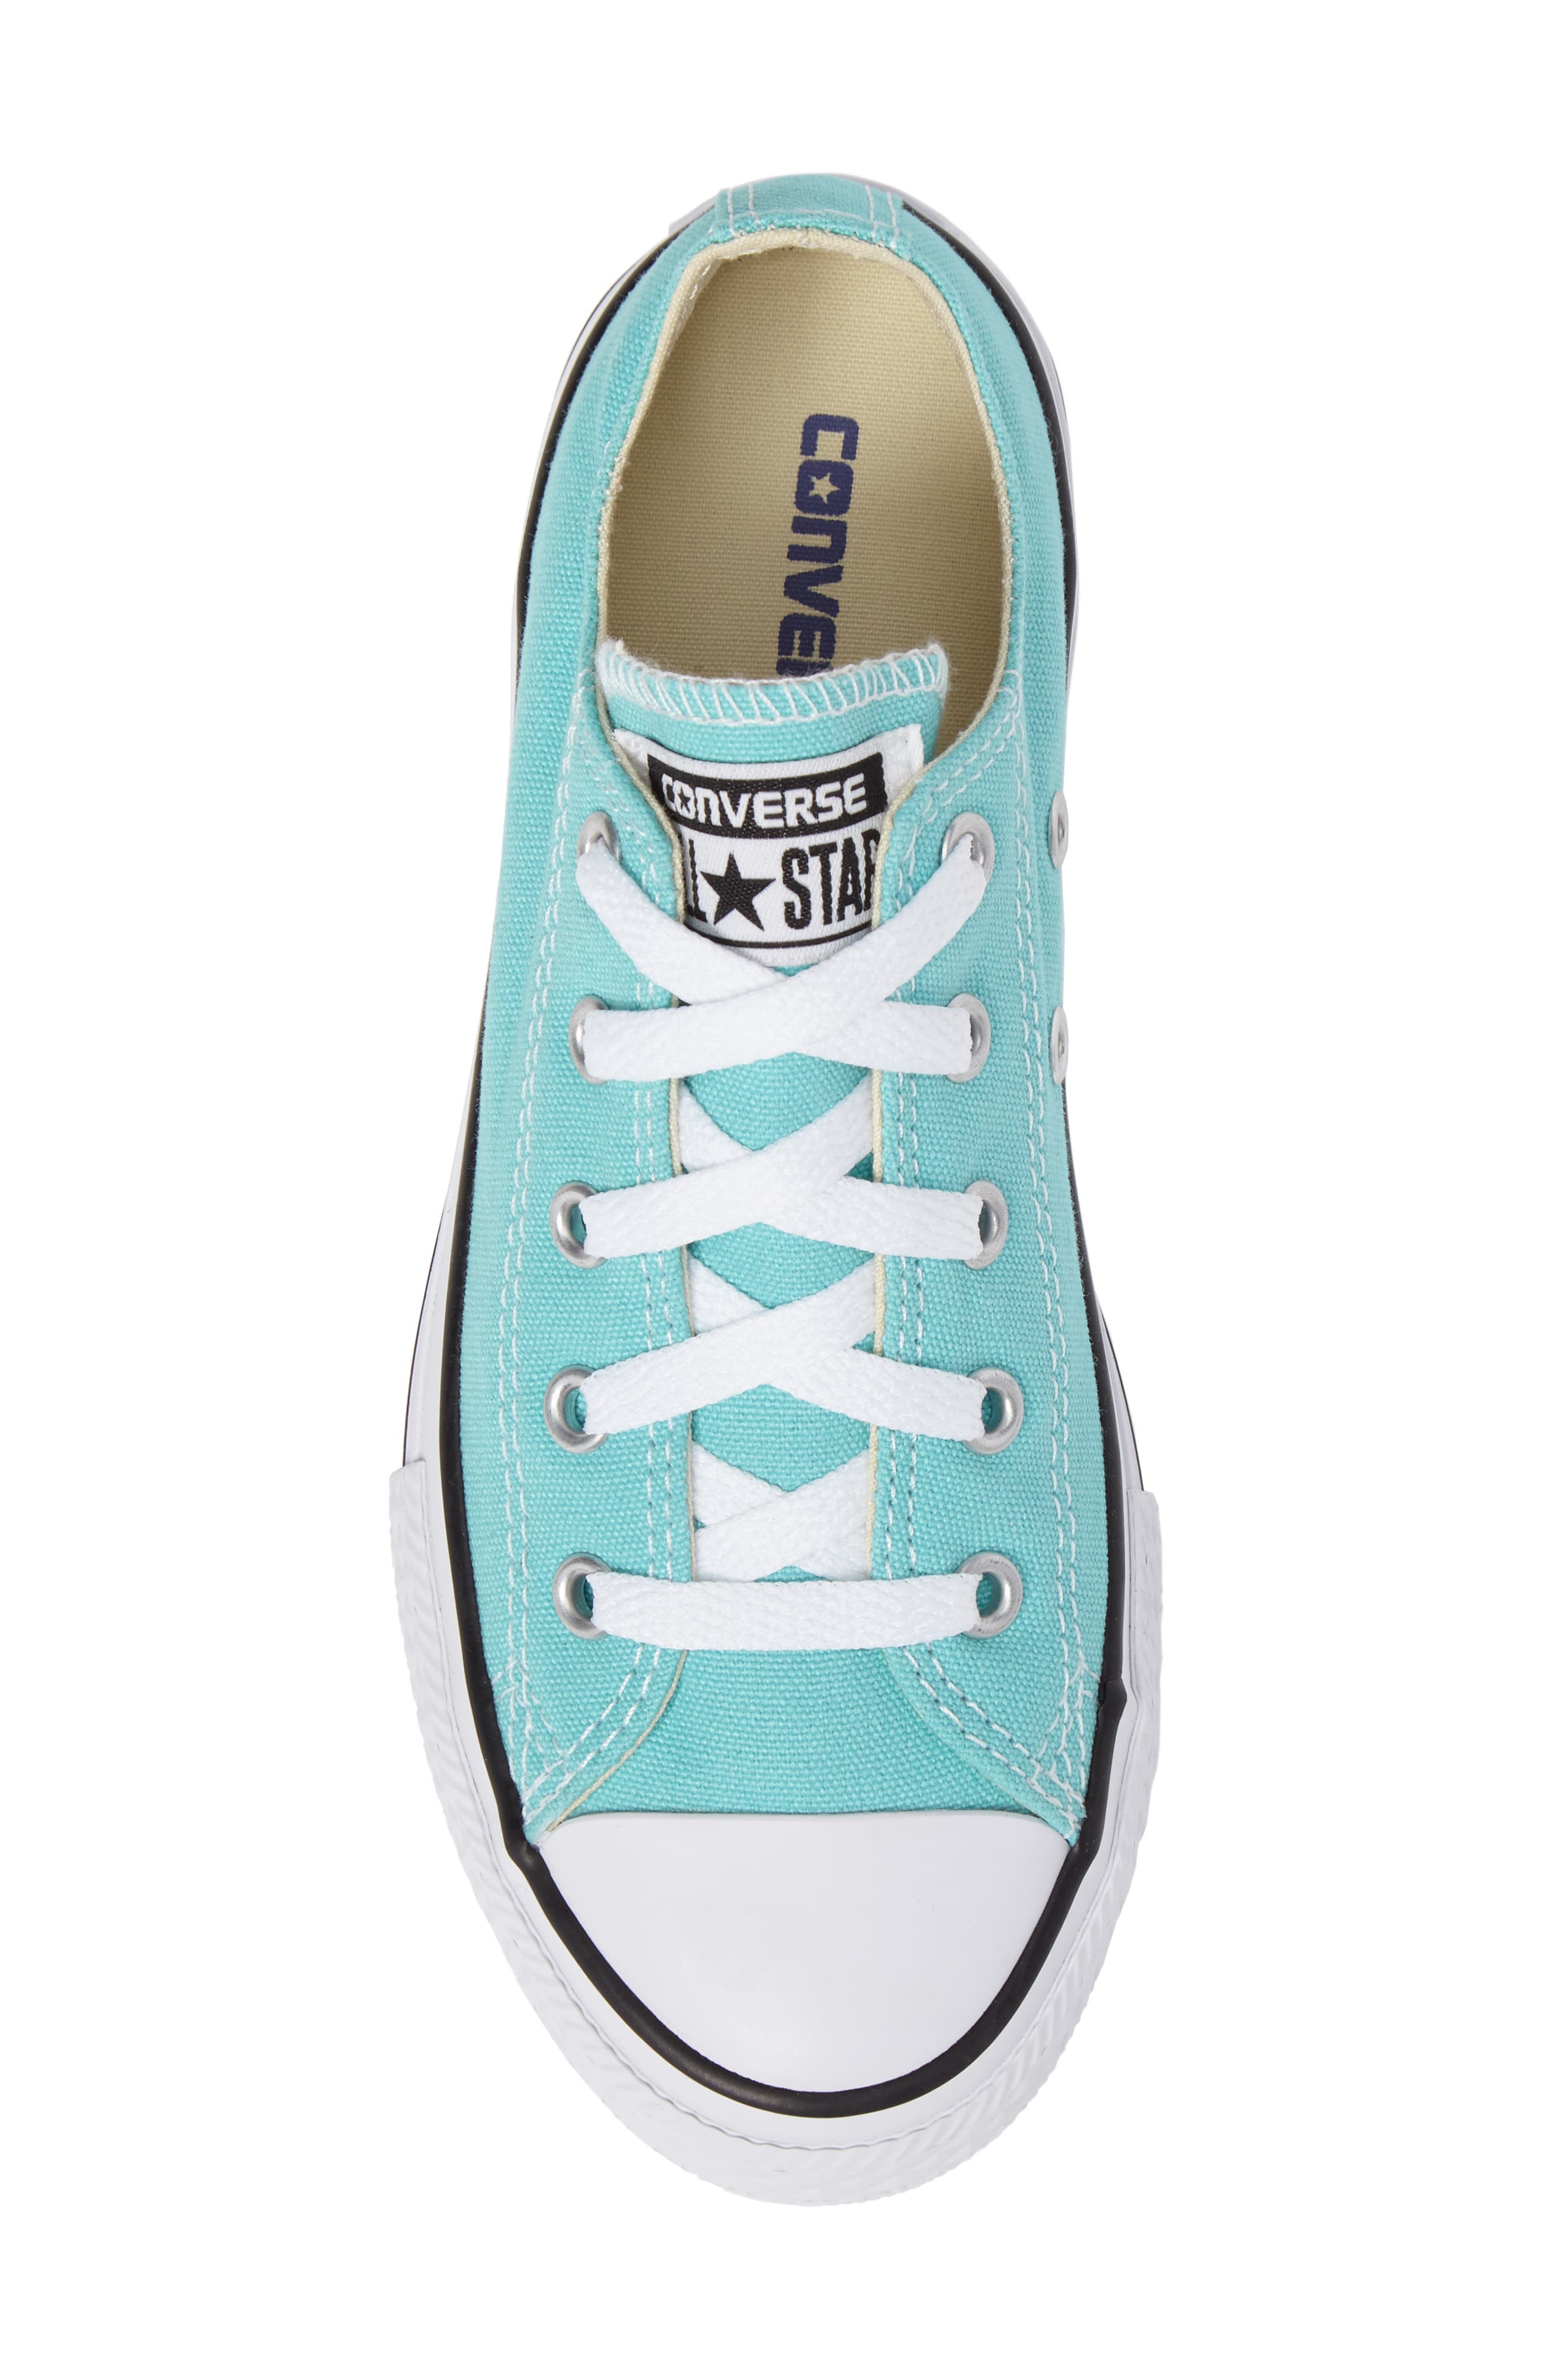 Chuck Taylor<sup>®</sup> All Star<sup>®</sup> Low Top Sneaker,                             Alternate thumbnail 5, color,                             Light Aqua/ Light Aqua